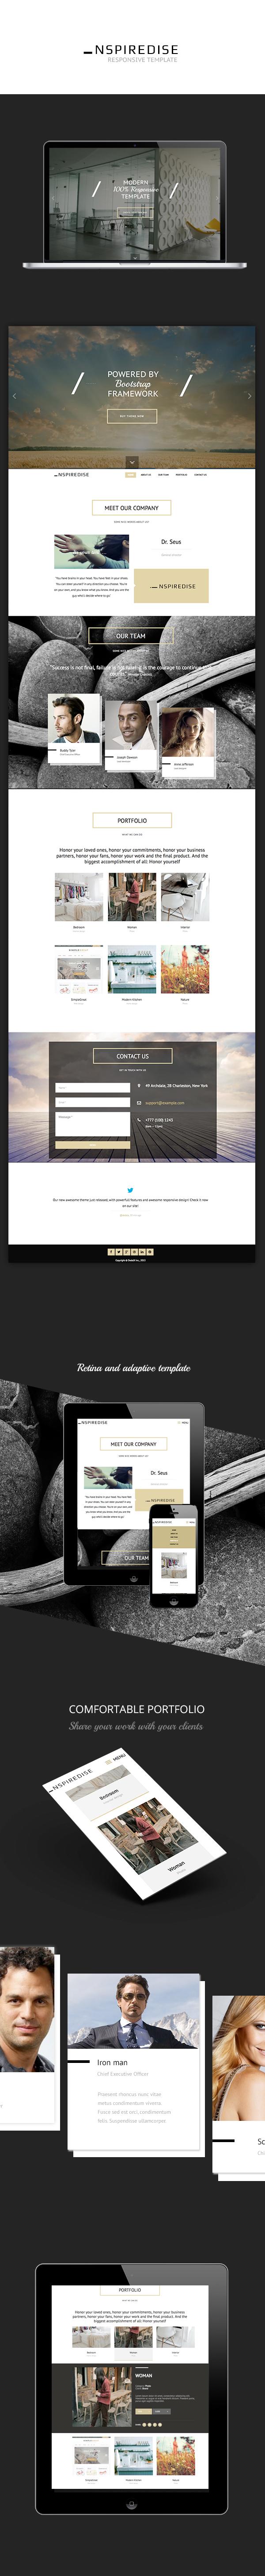 Web Webdesign Responsive Adaptive template themeforest